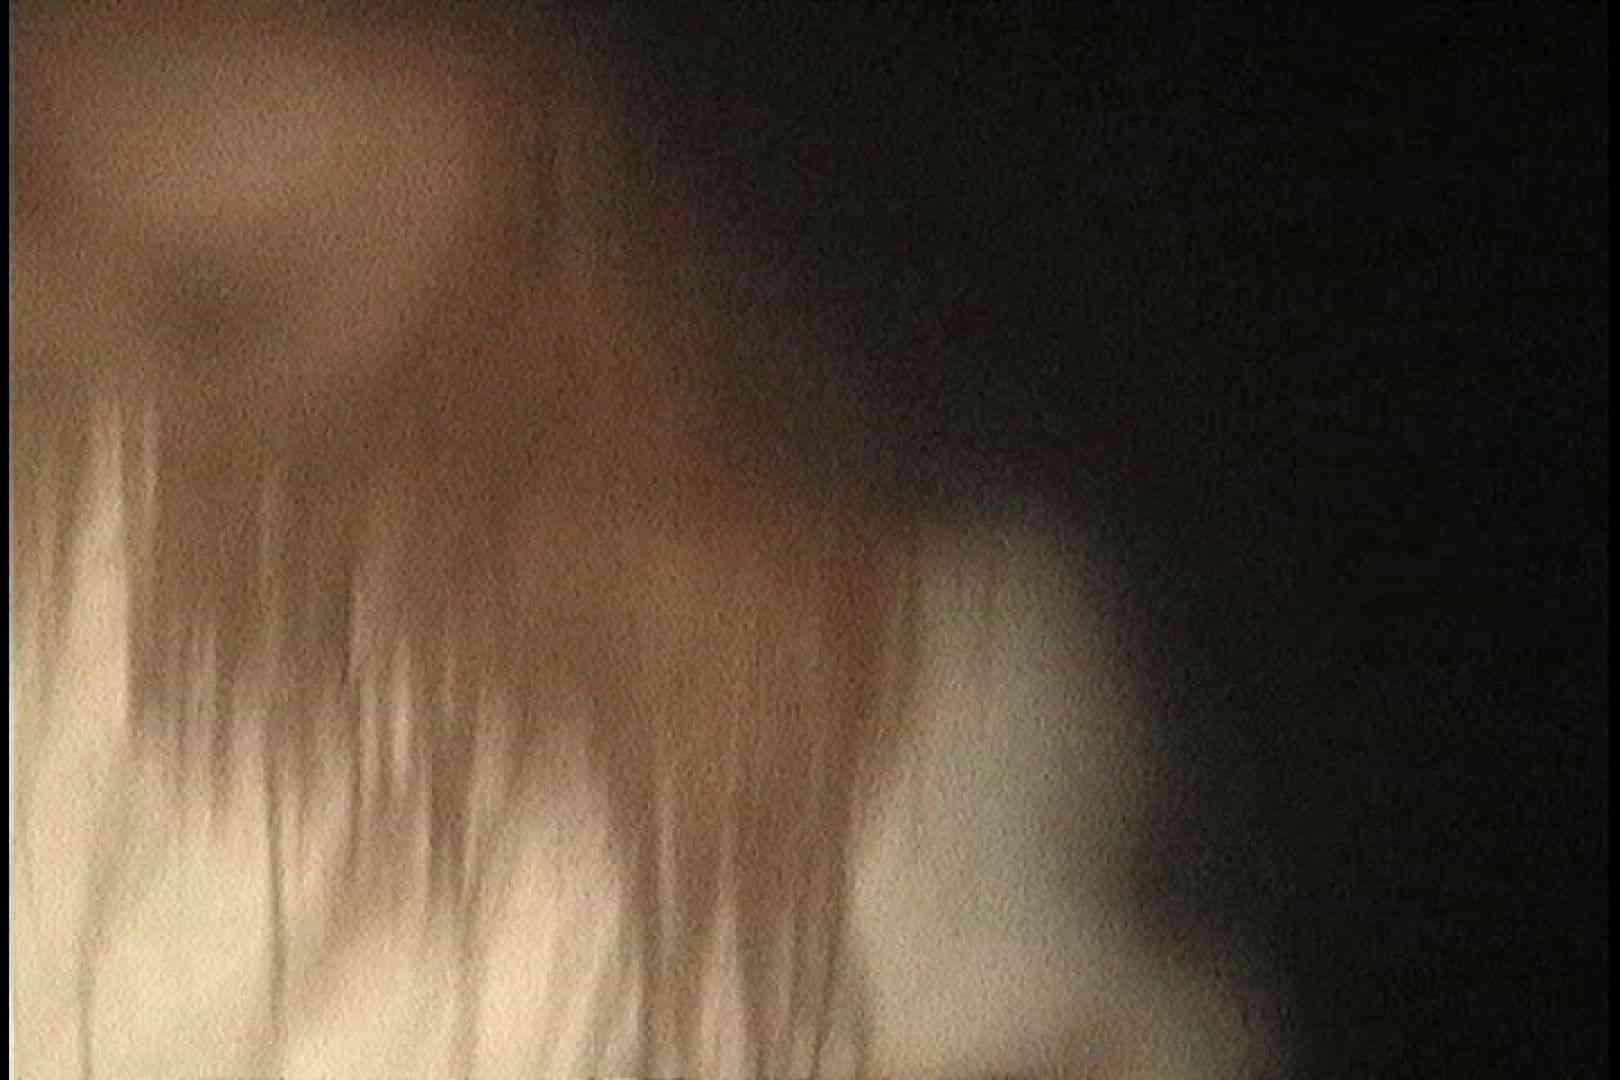 No.53 金髪ギャルの乳首に向かってズームイン ギャル攻め 戯れ無修正画像 98画像 18